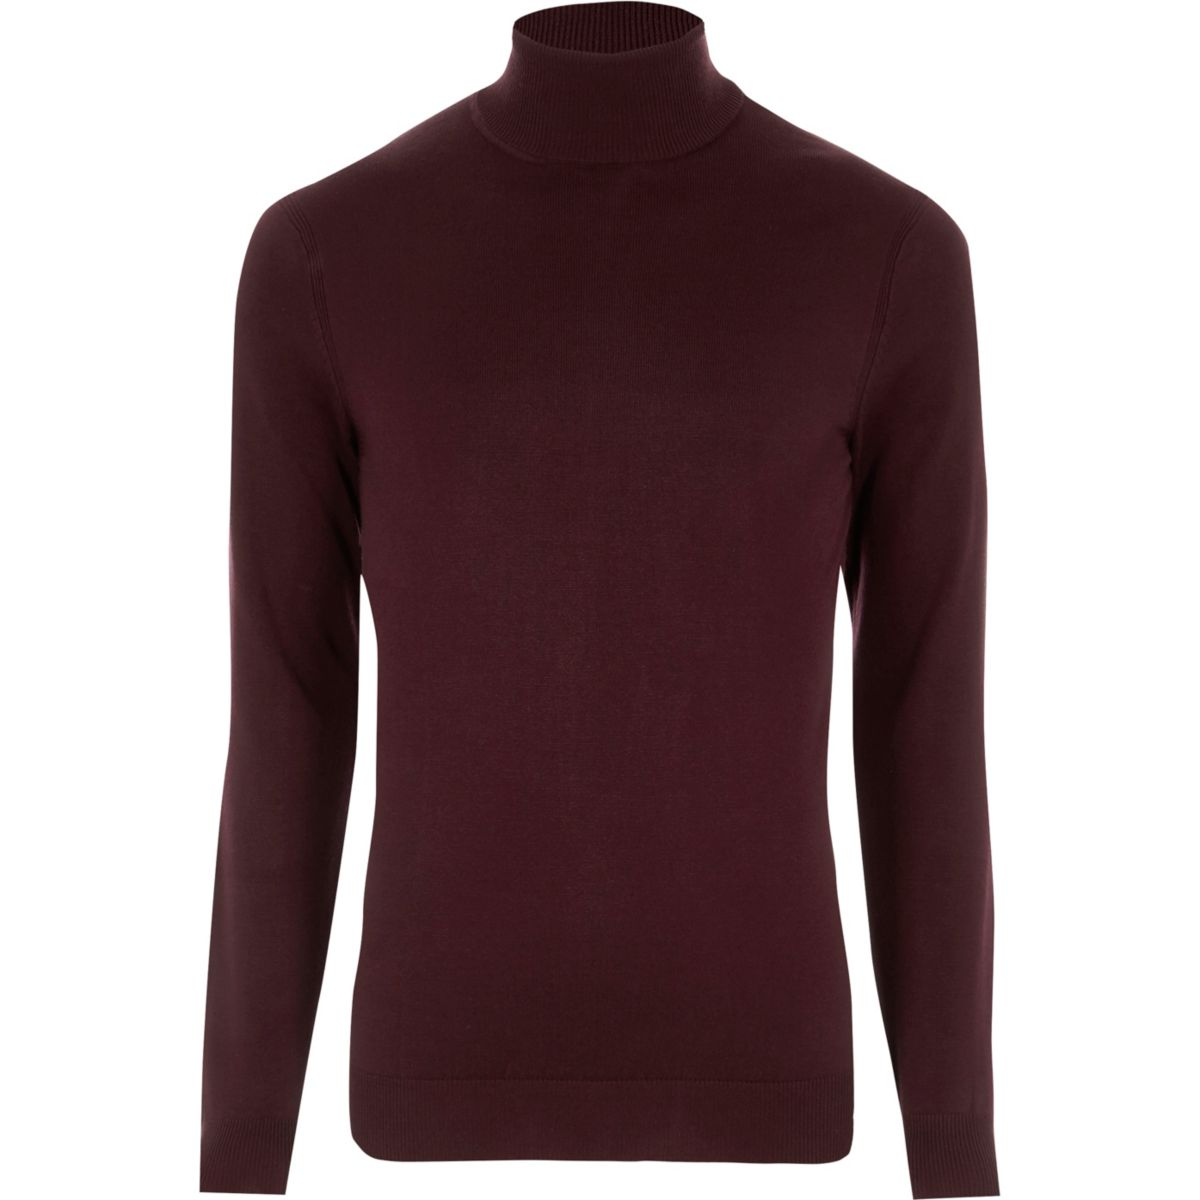 Burgundy roll neck long sleeve sweater